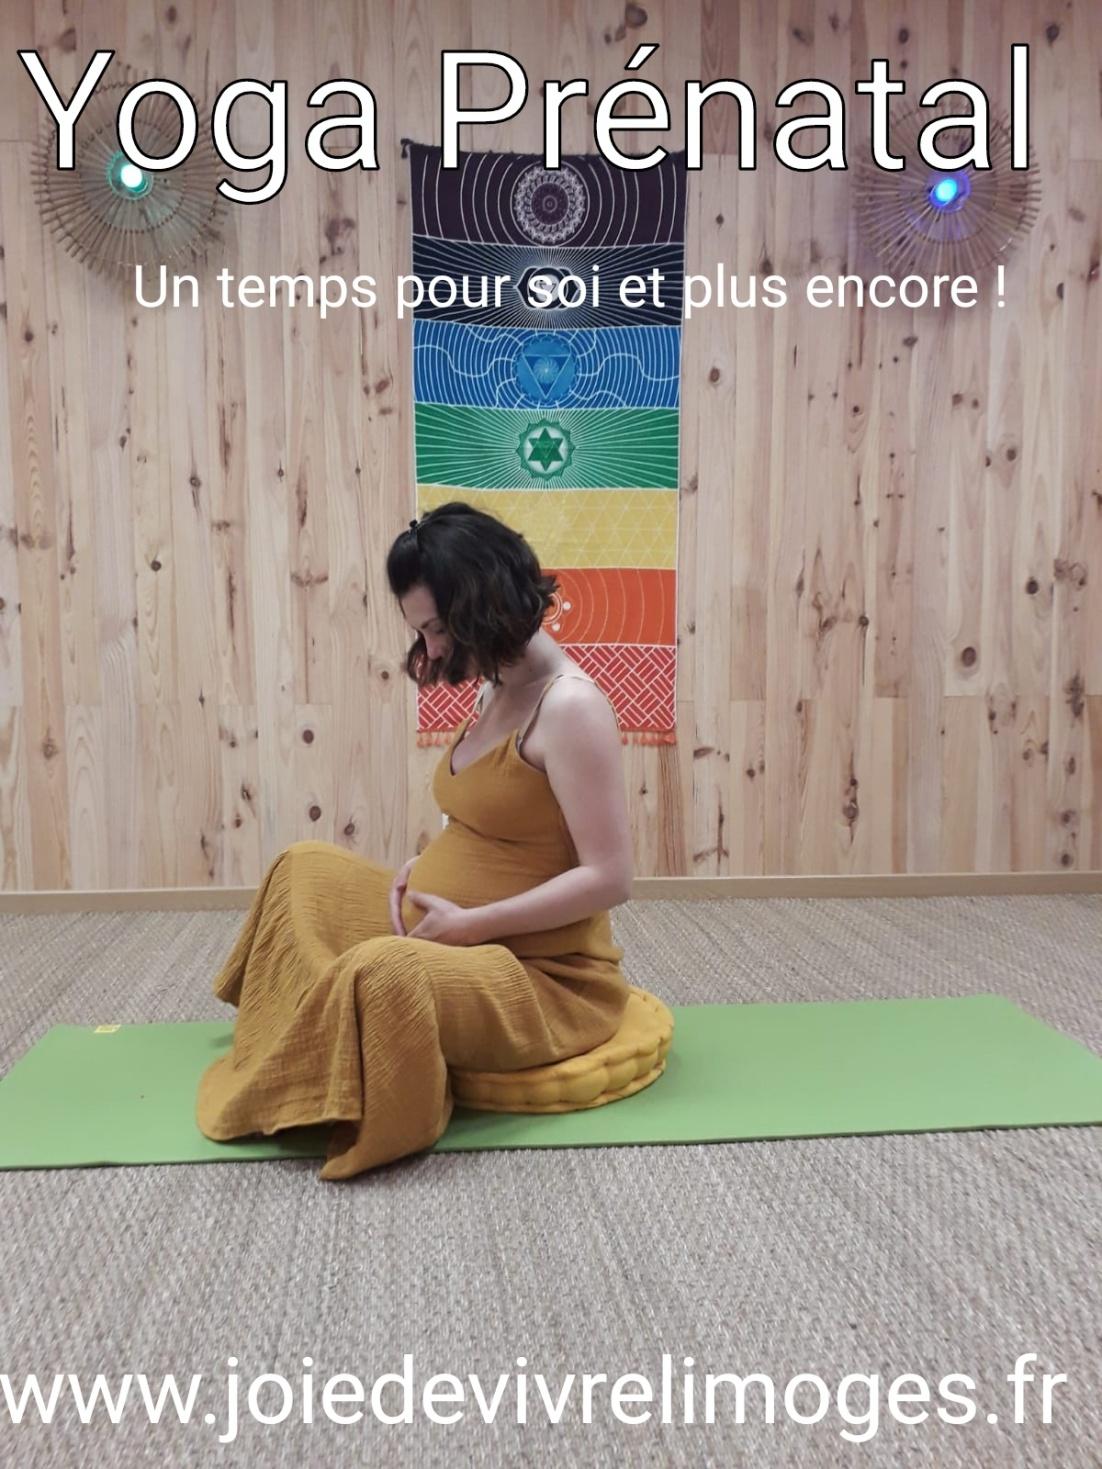 yogaprénataljoiedevivrelimoges